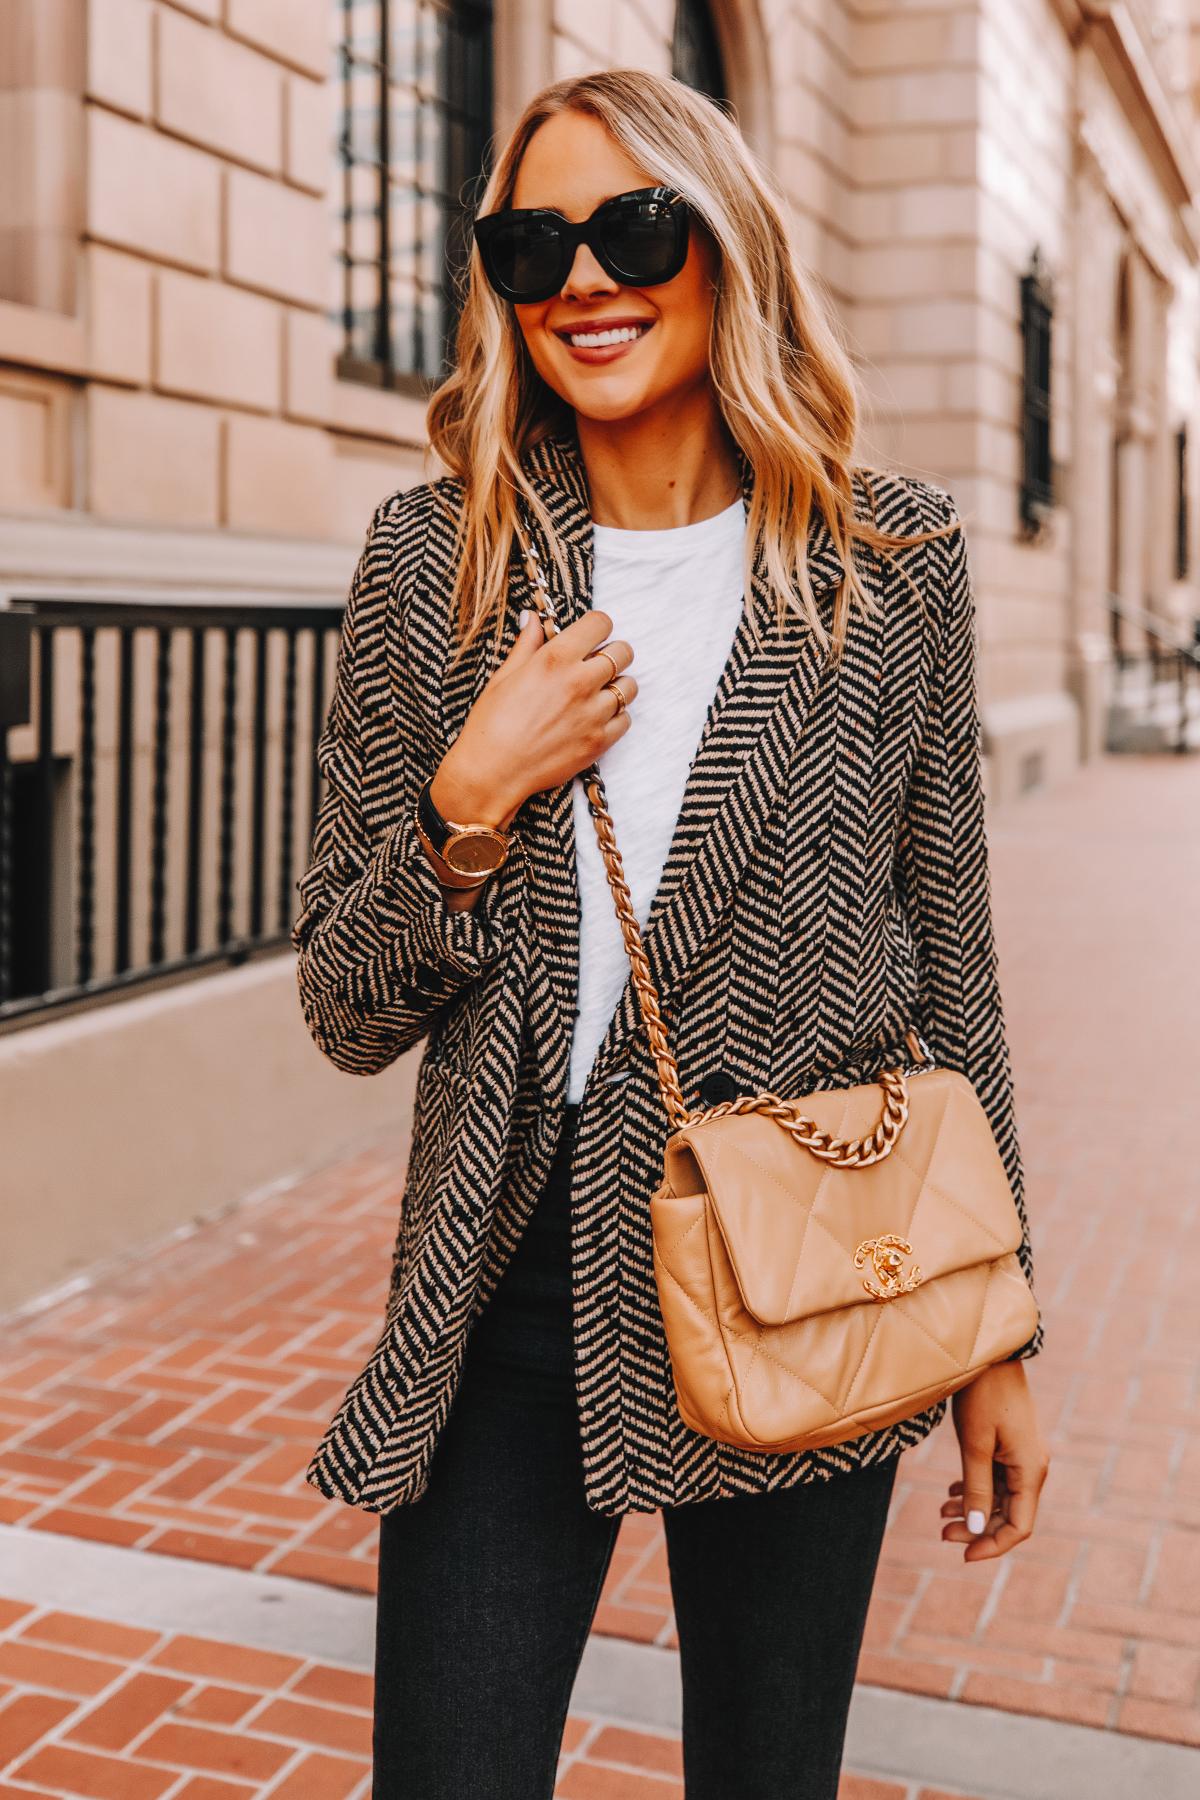 Fashion Jackson Wearing Anine Bing Black Herringbone Blazer White Tshirt Black Jeans Chanel 19 Handbag Garmin Vivomove Smartwatch